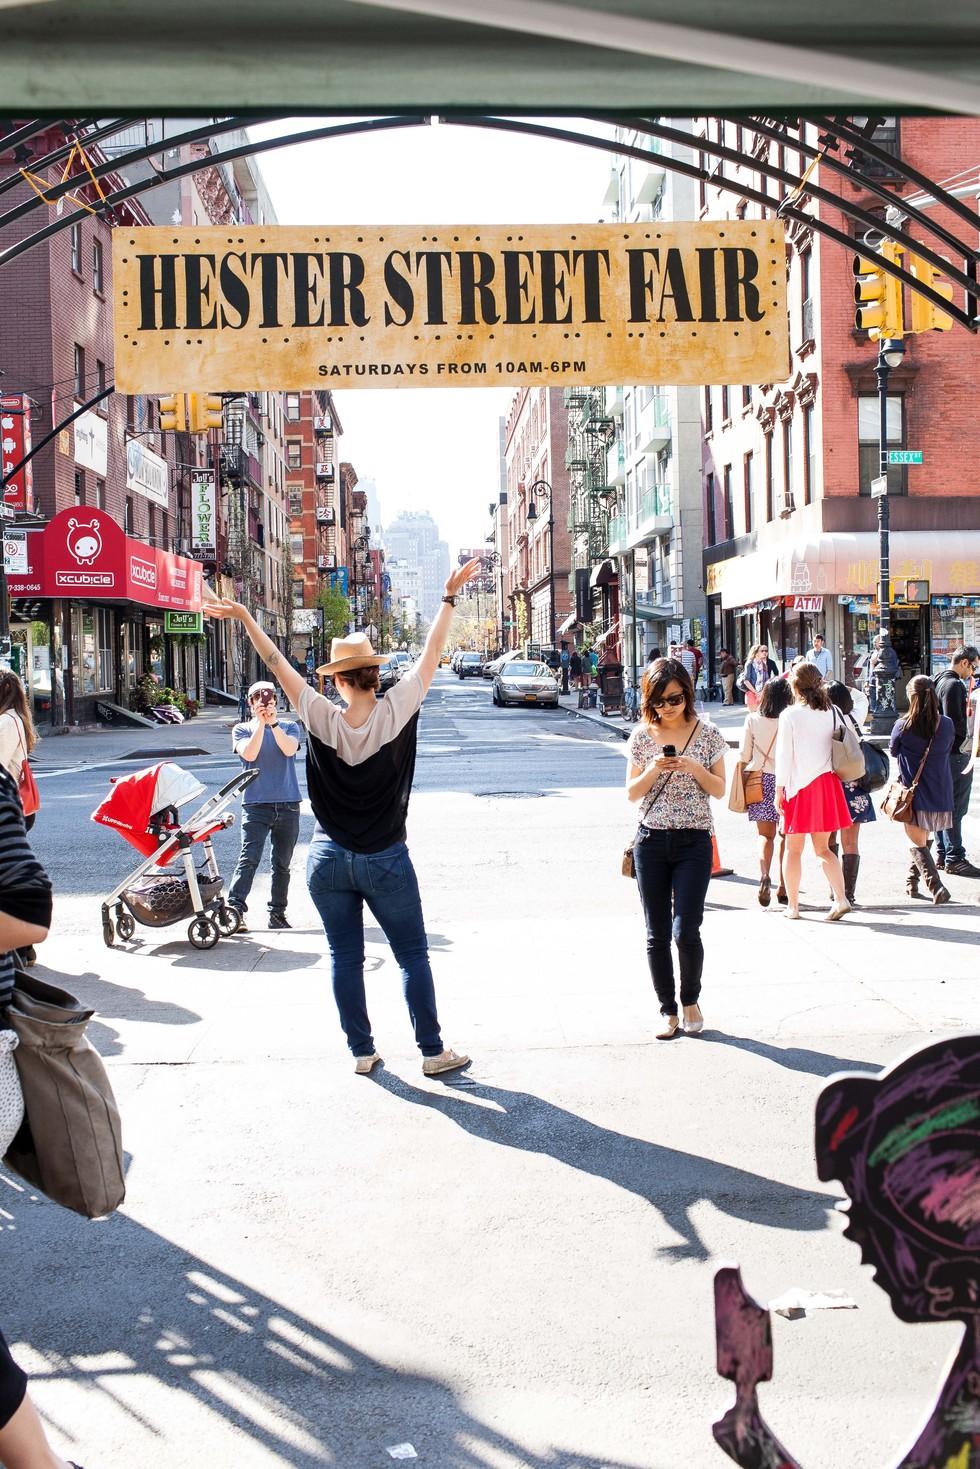 Hester Street Fair 2013